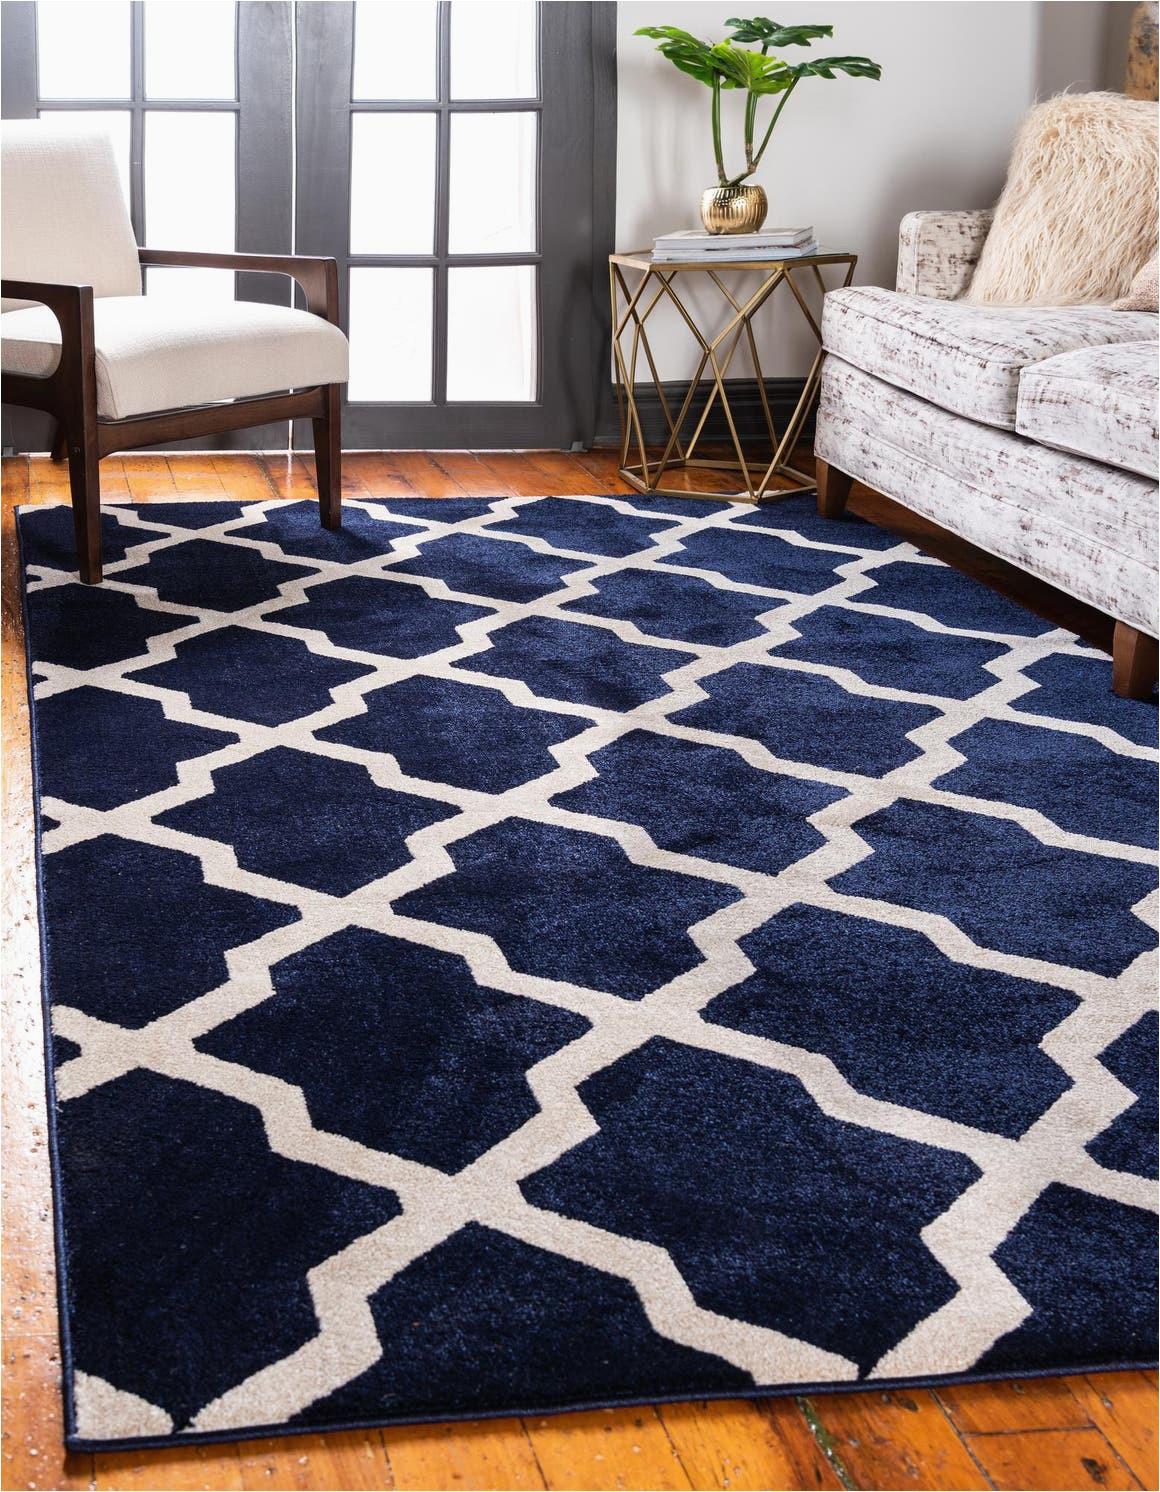 navy blue 9x12 lattice area rug